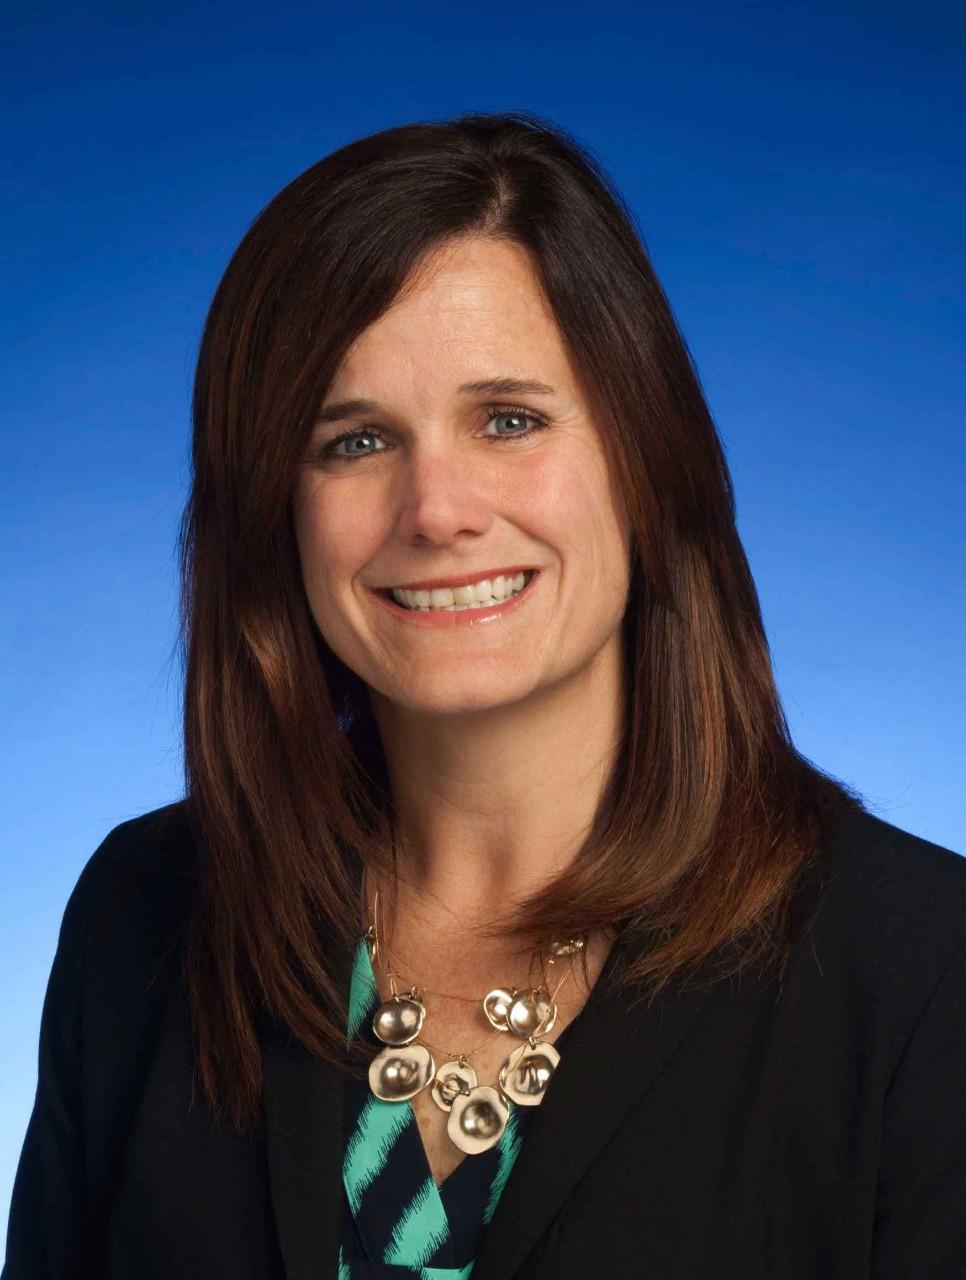 Melissa McGee, MS